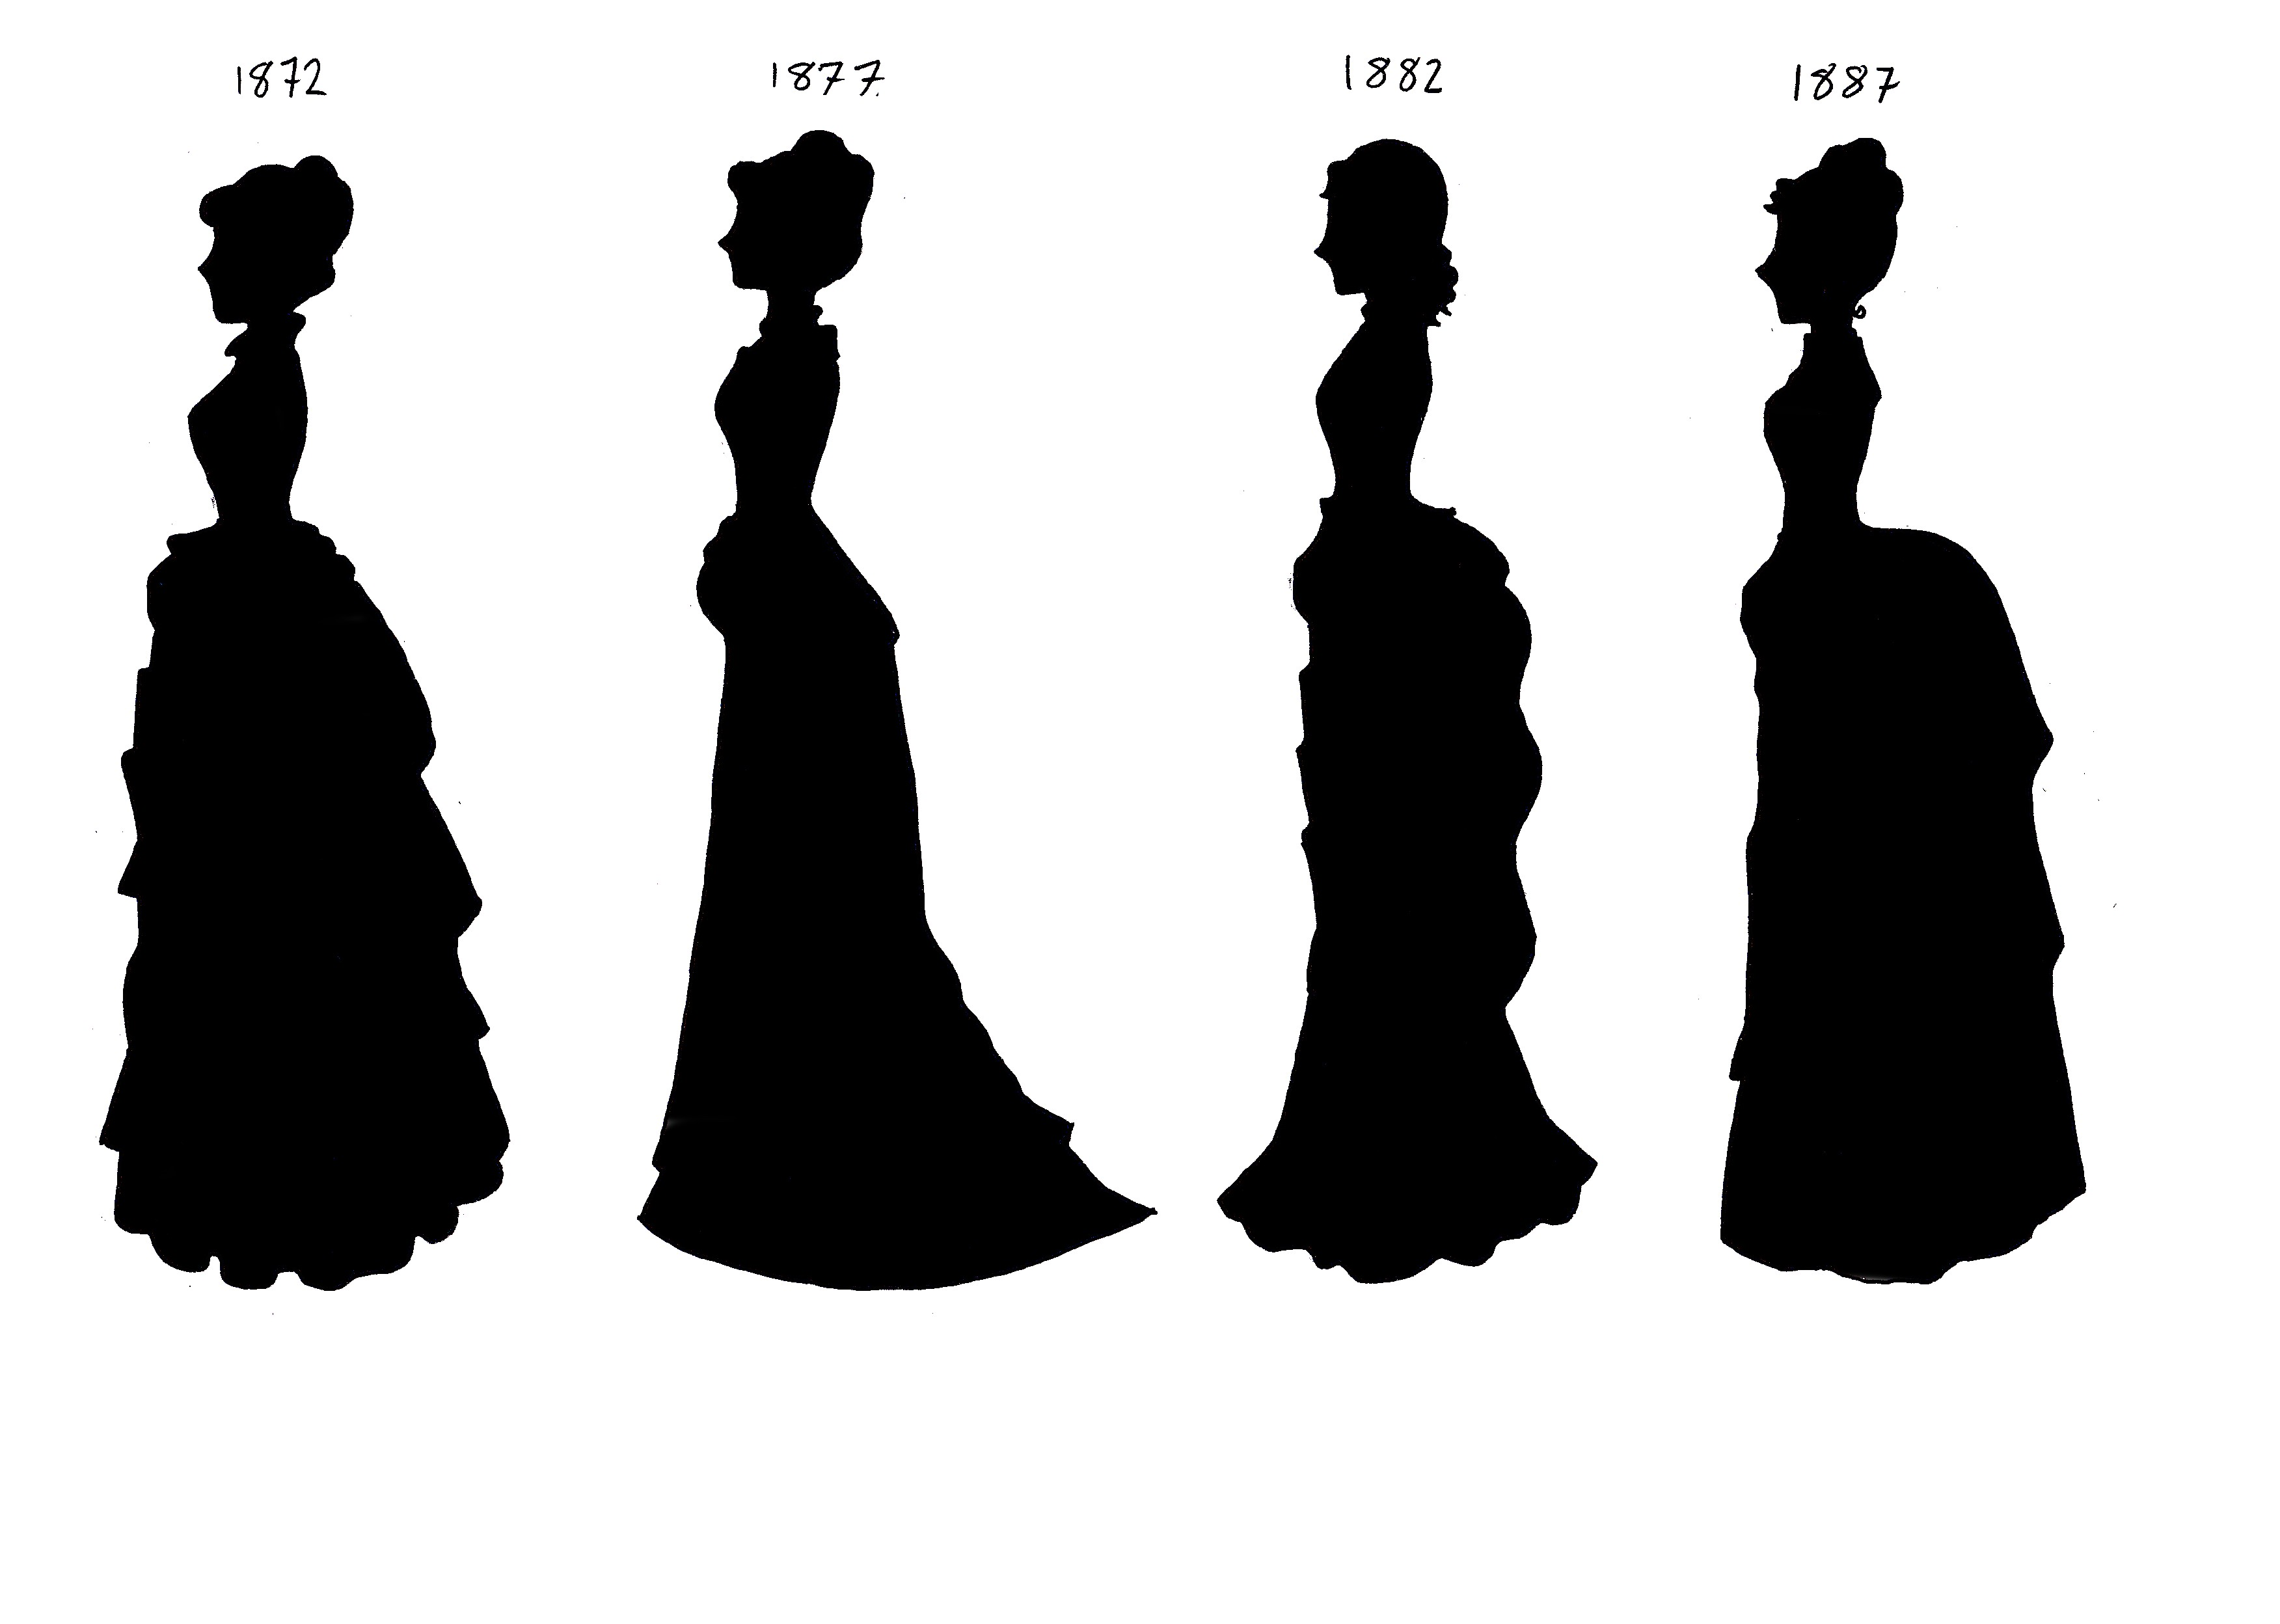 3504x2496 Victorian Silhouettes 1872 87